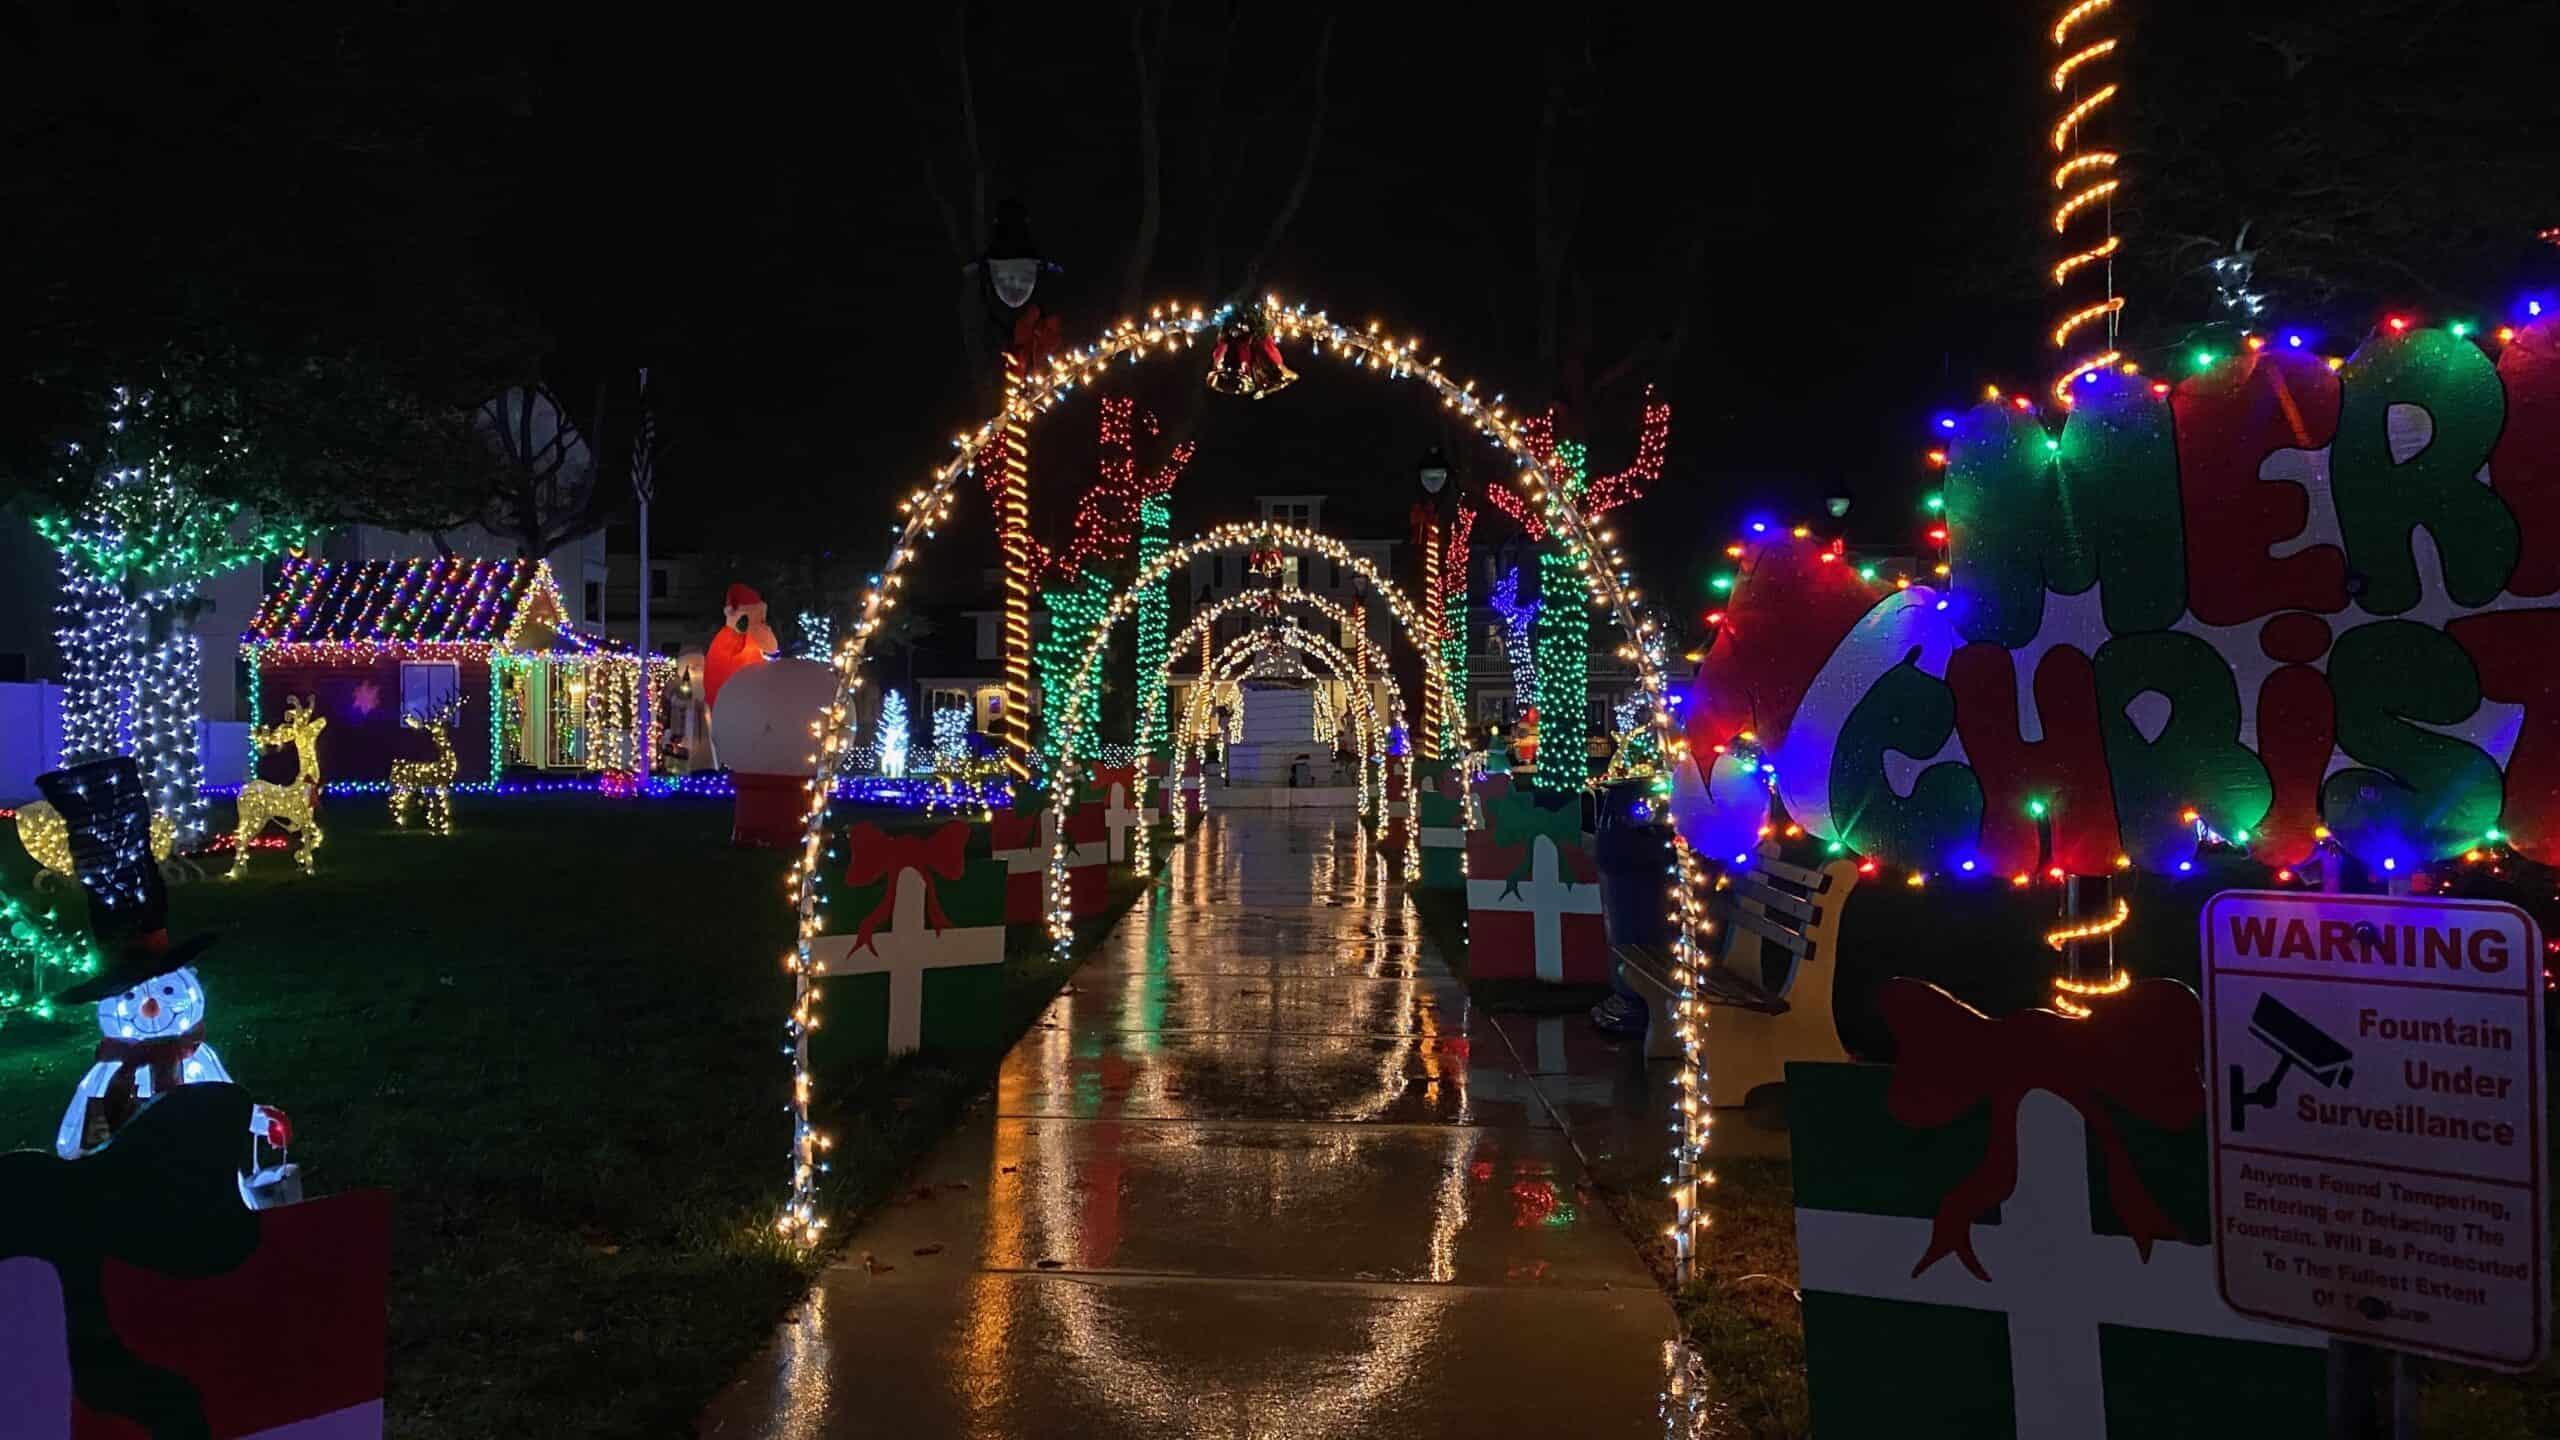 Wildwood's Santa's Village (Tour)